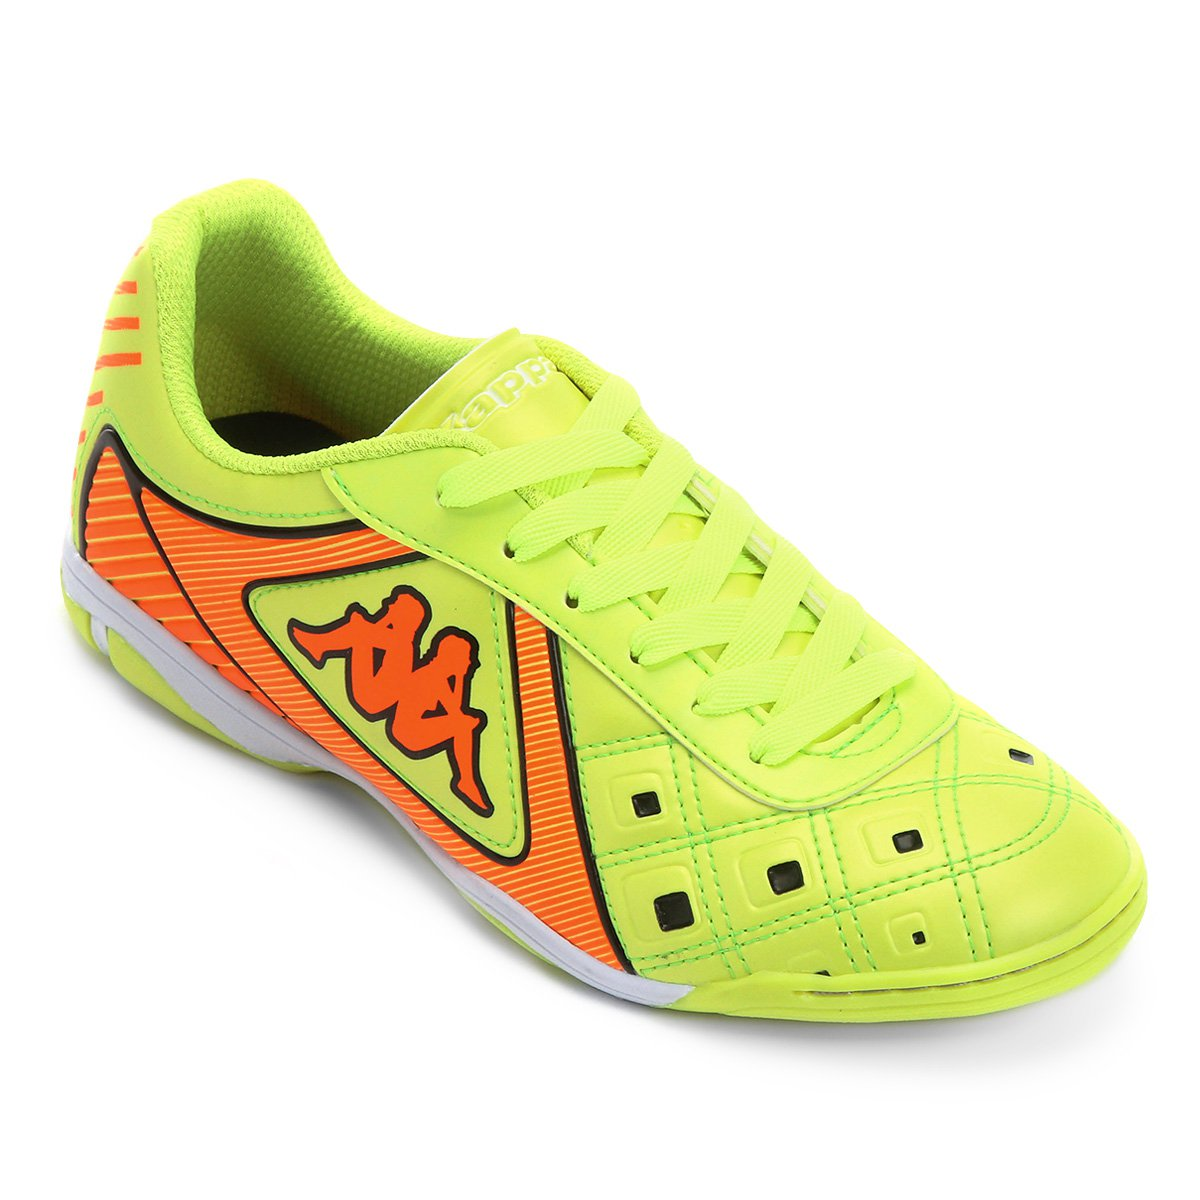 72e4d3503c Chuteira Futsal Kappa Catanzaro - Compre Agora